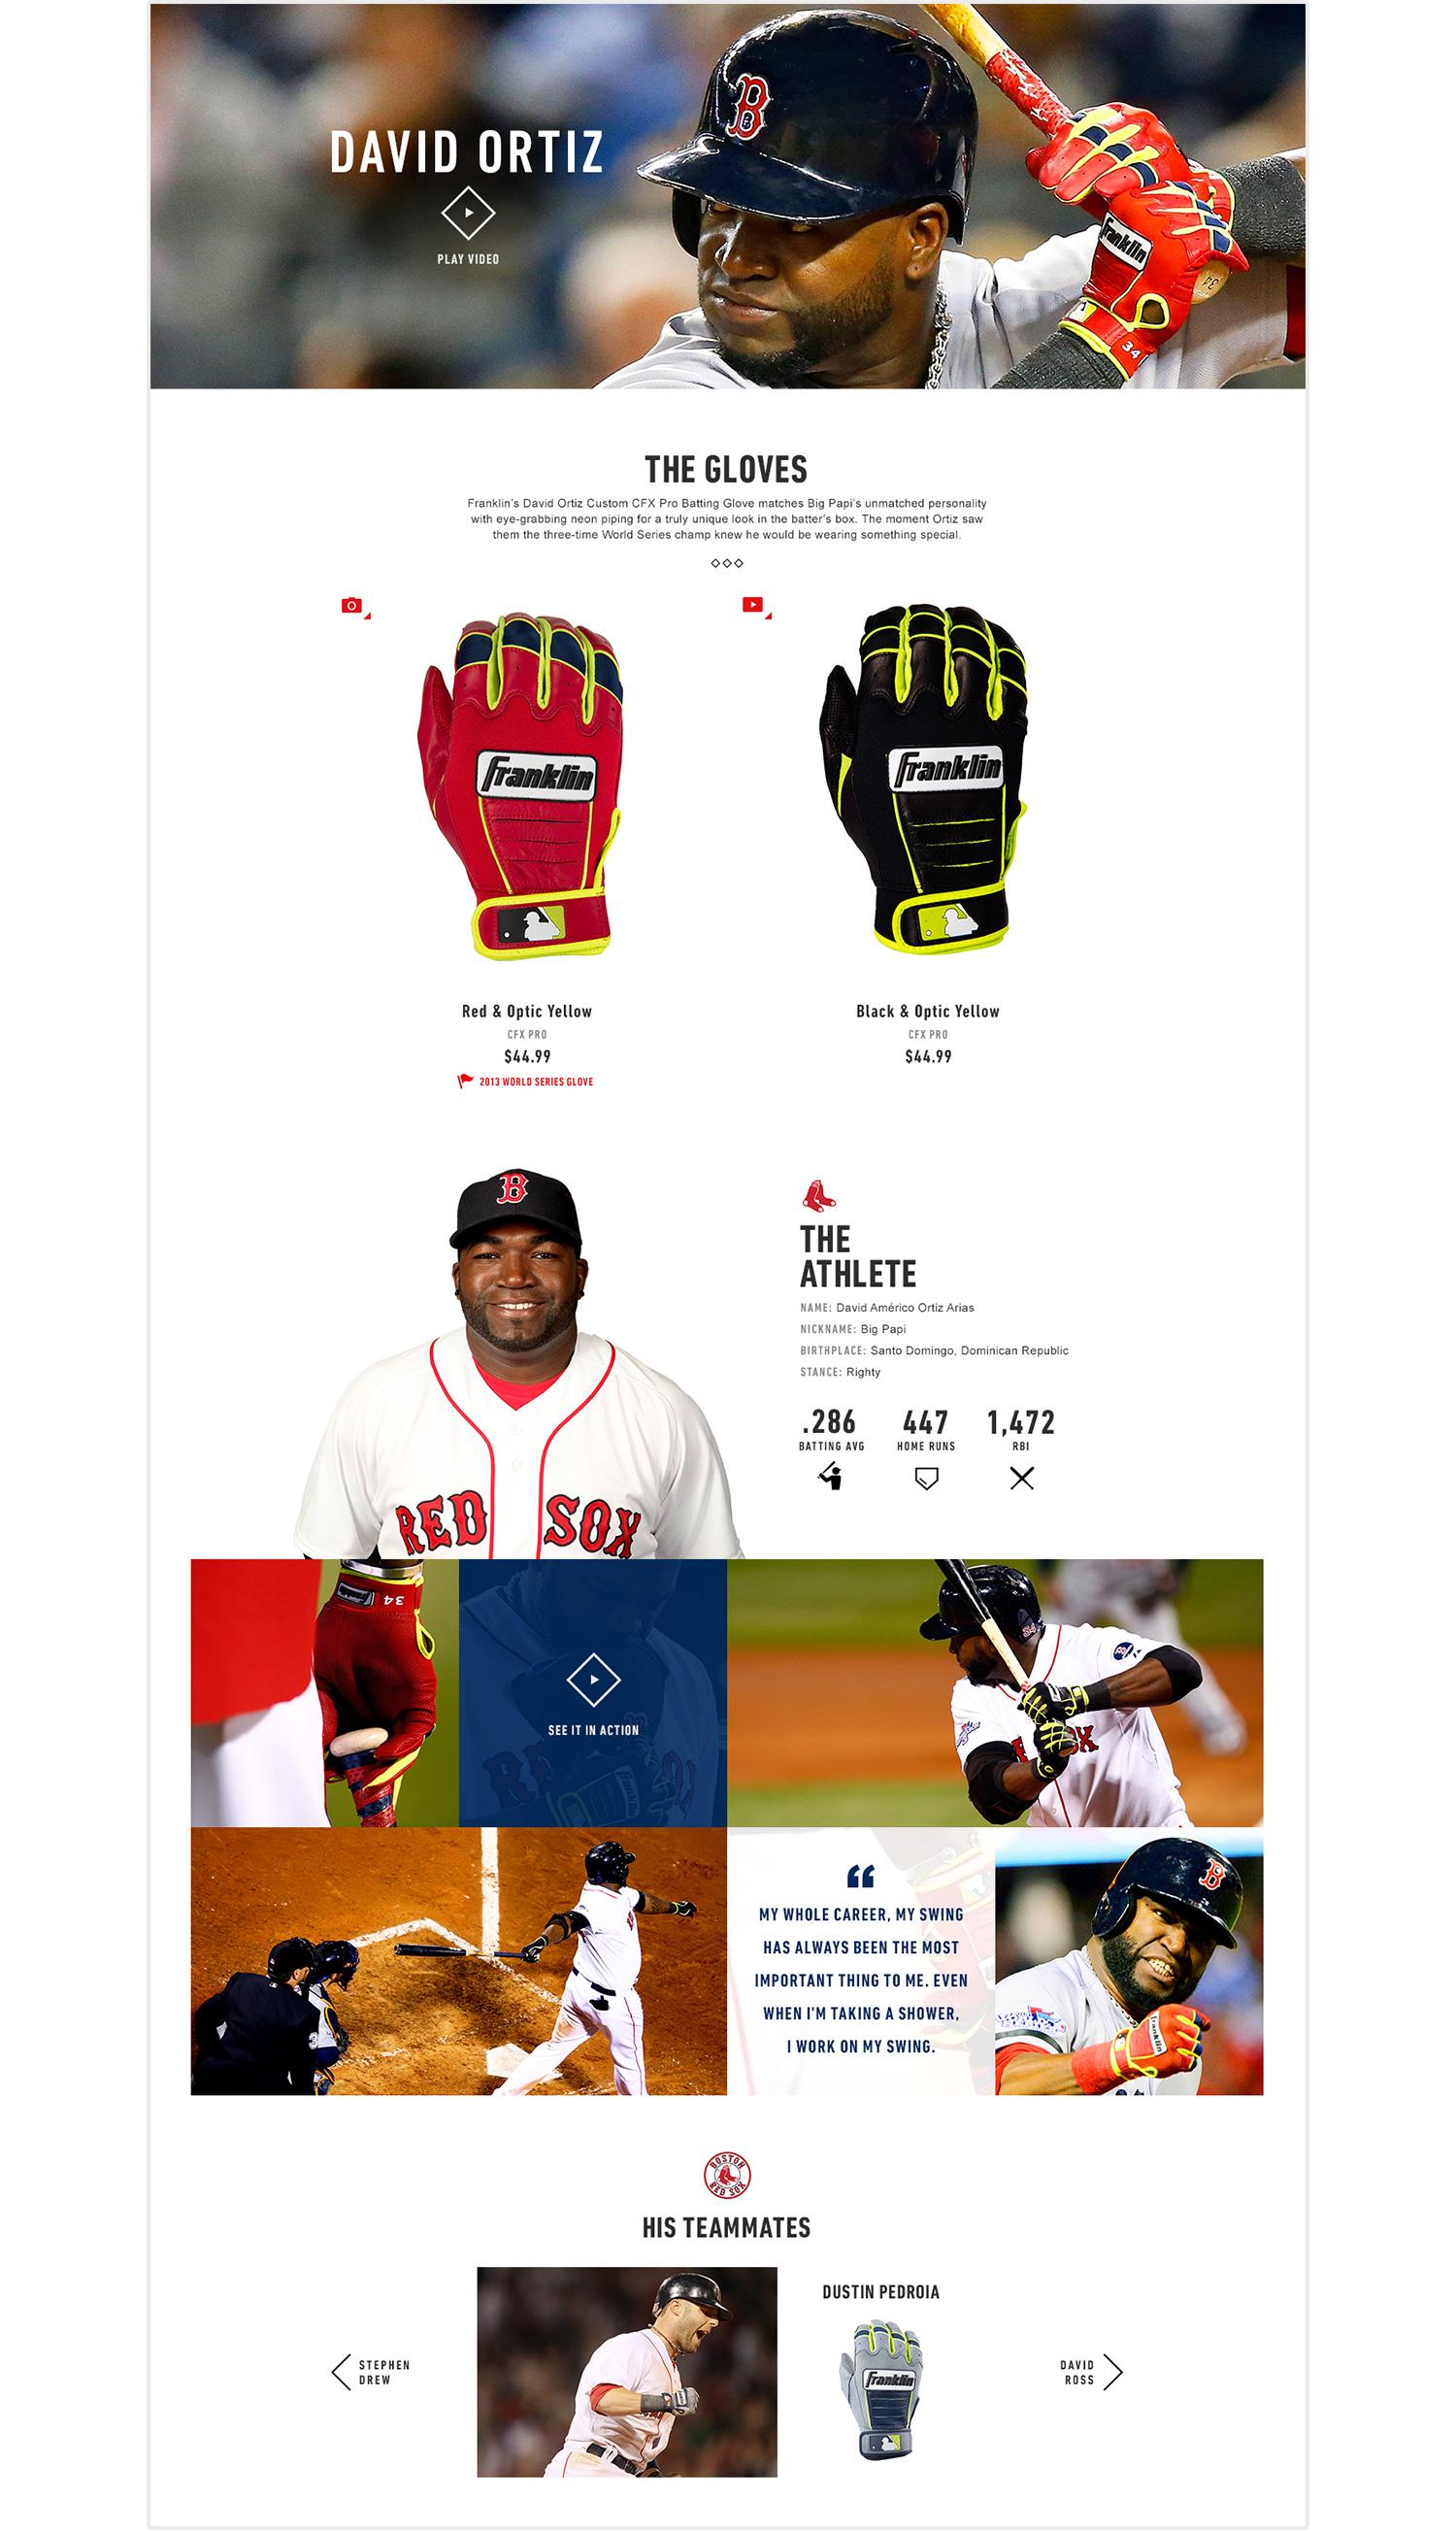 FRA-Player-Page.jpg